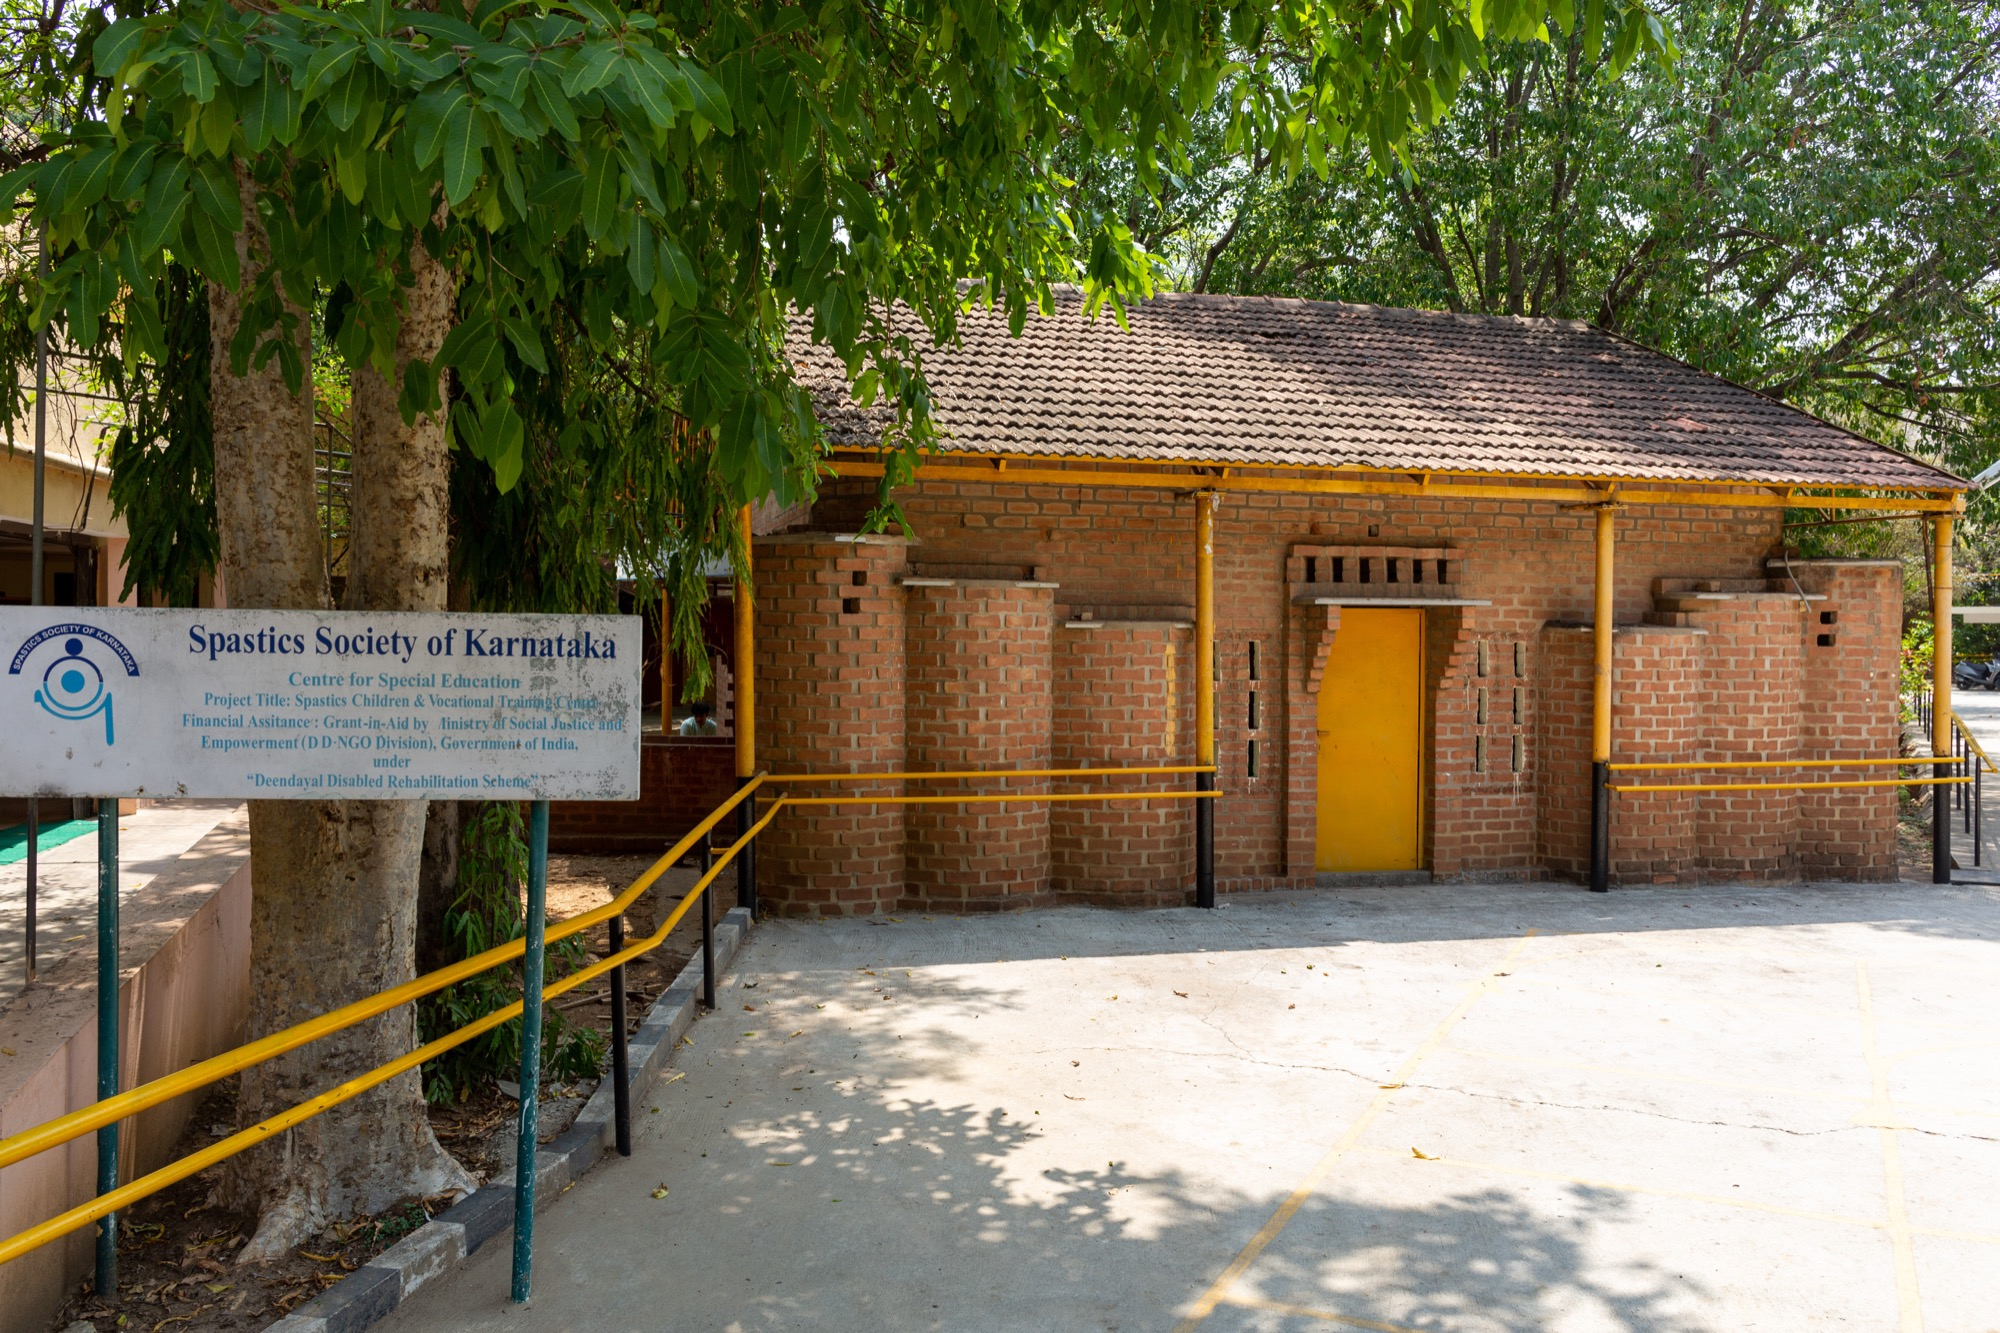 Spastics Society of Karnataka, Biome Environmental Solutions